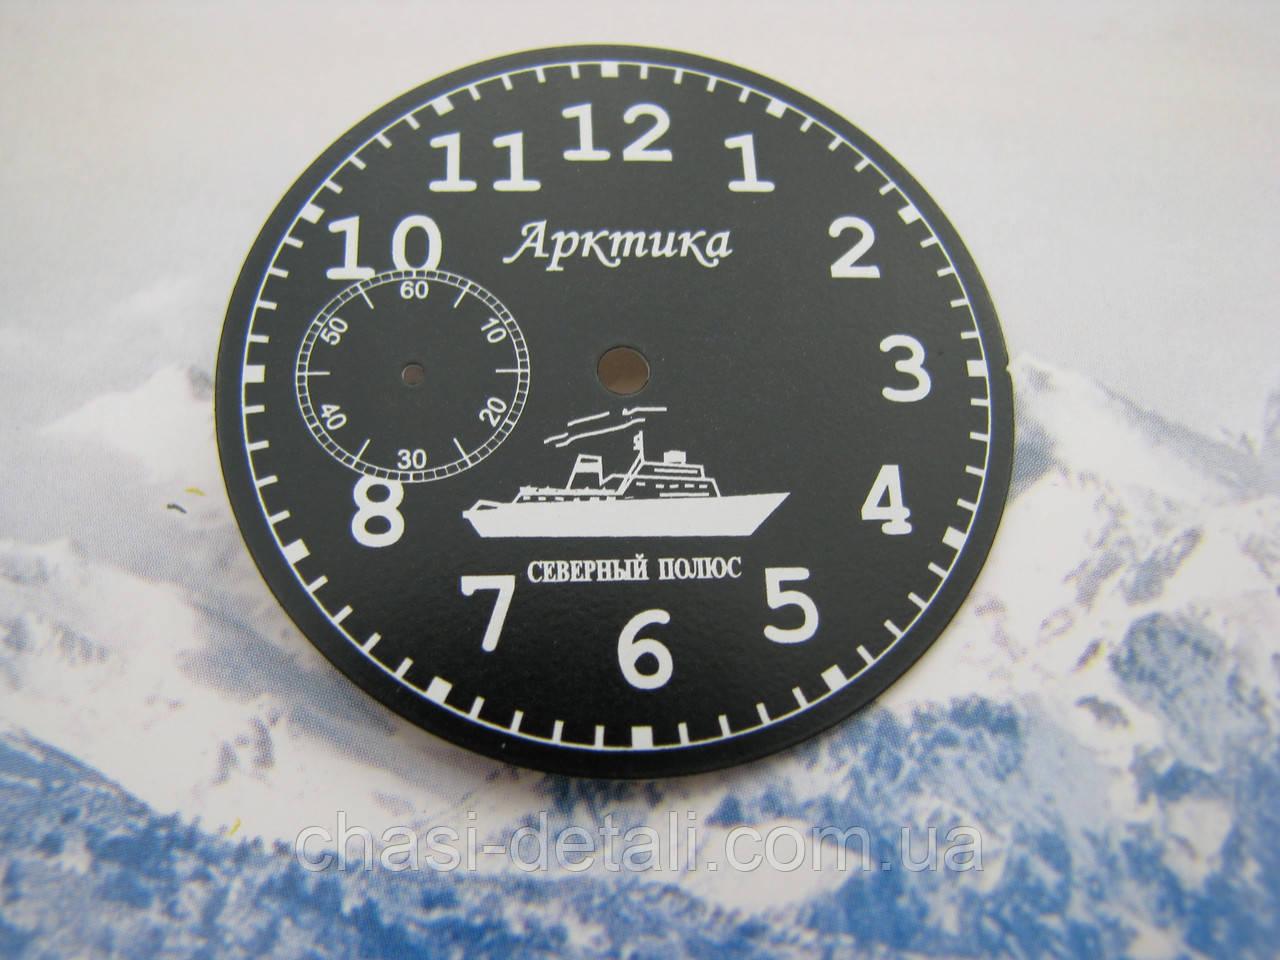 Циферблат годин Блискавка. Діаметр - 39,00 мм.